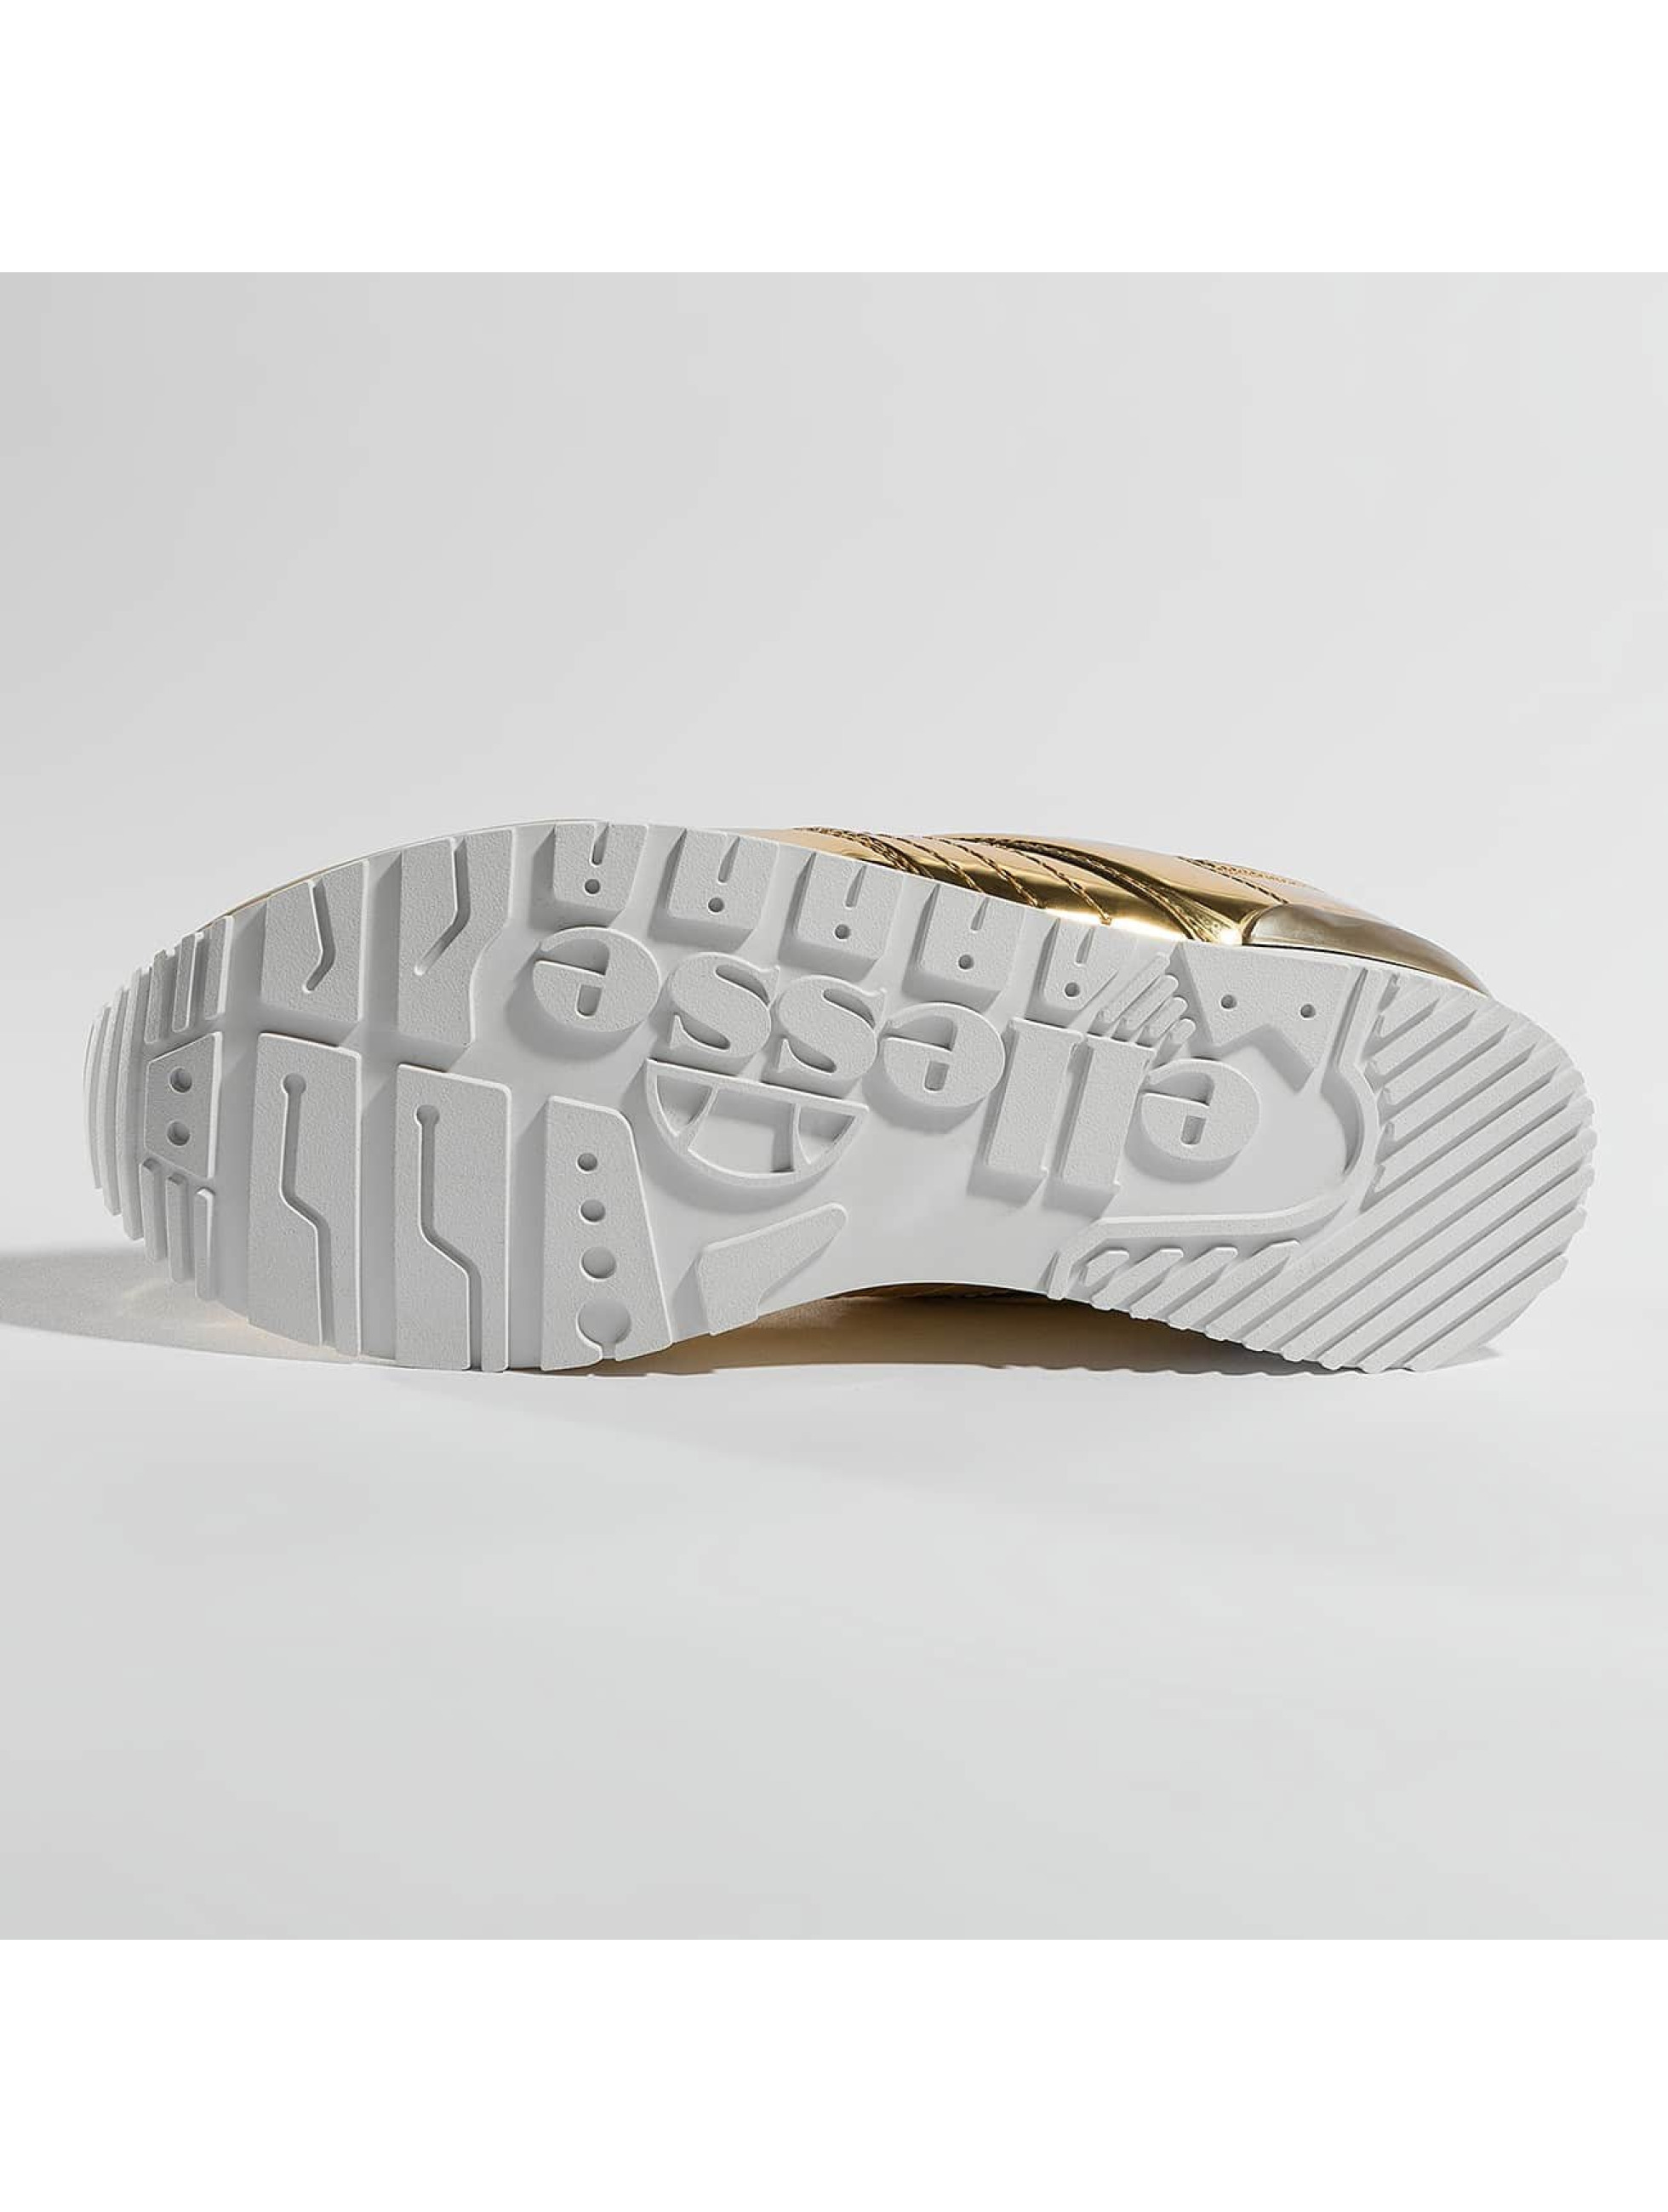 Ellesse Baskets Heritage City Runner Metallic Runner or